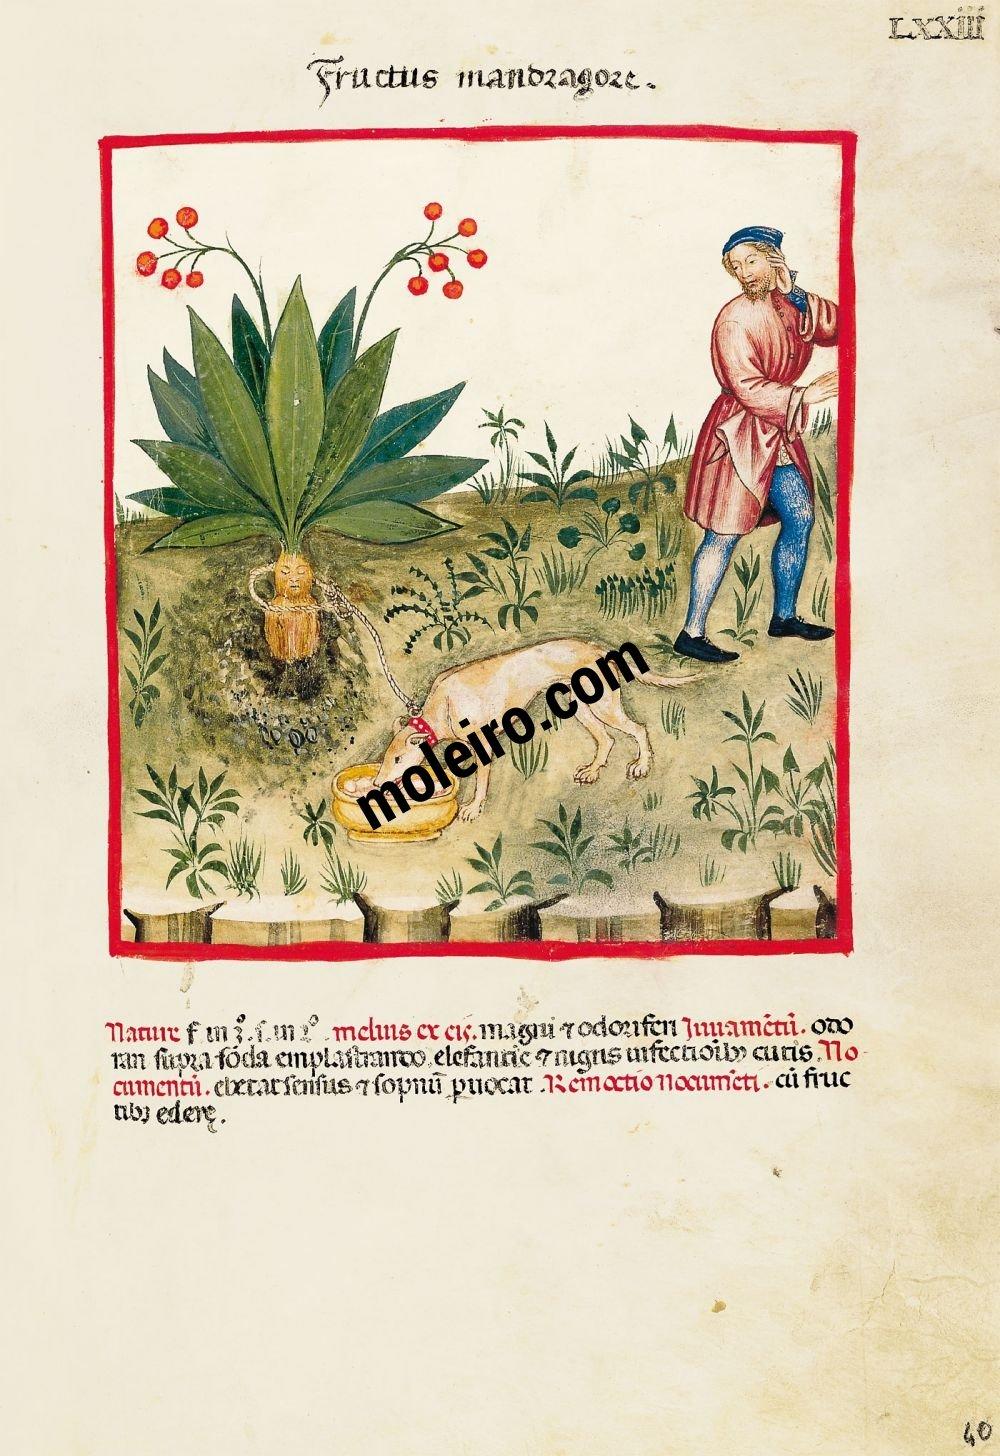 Theatrum Sanitatis f. LXXIII, Mandrake fruit